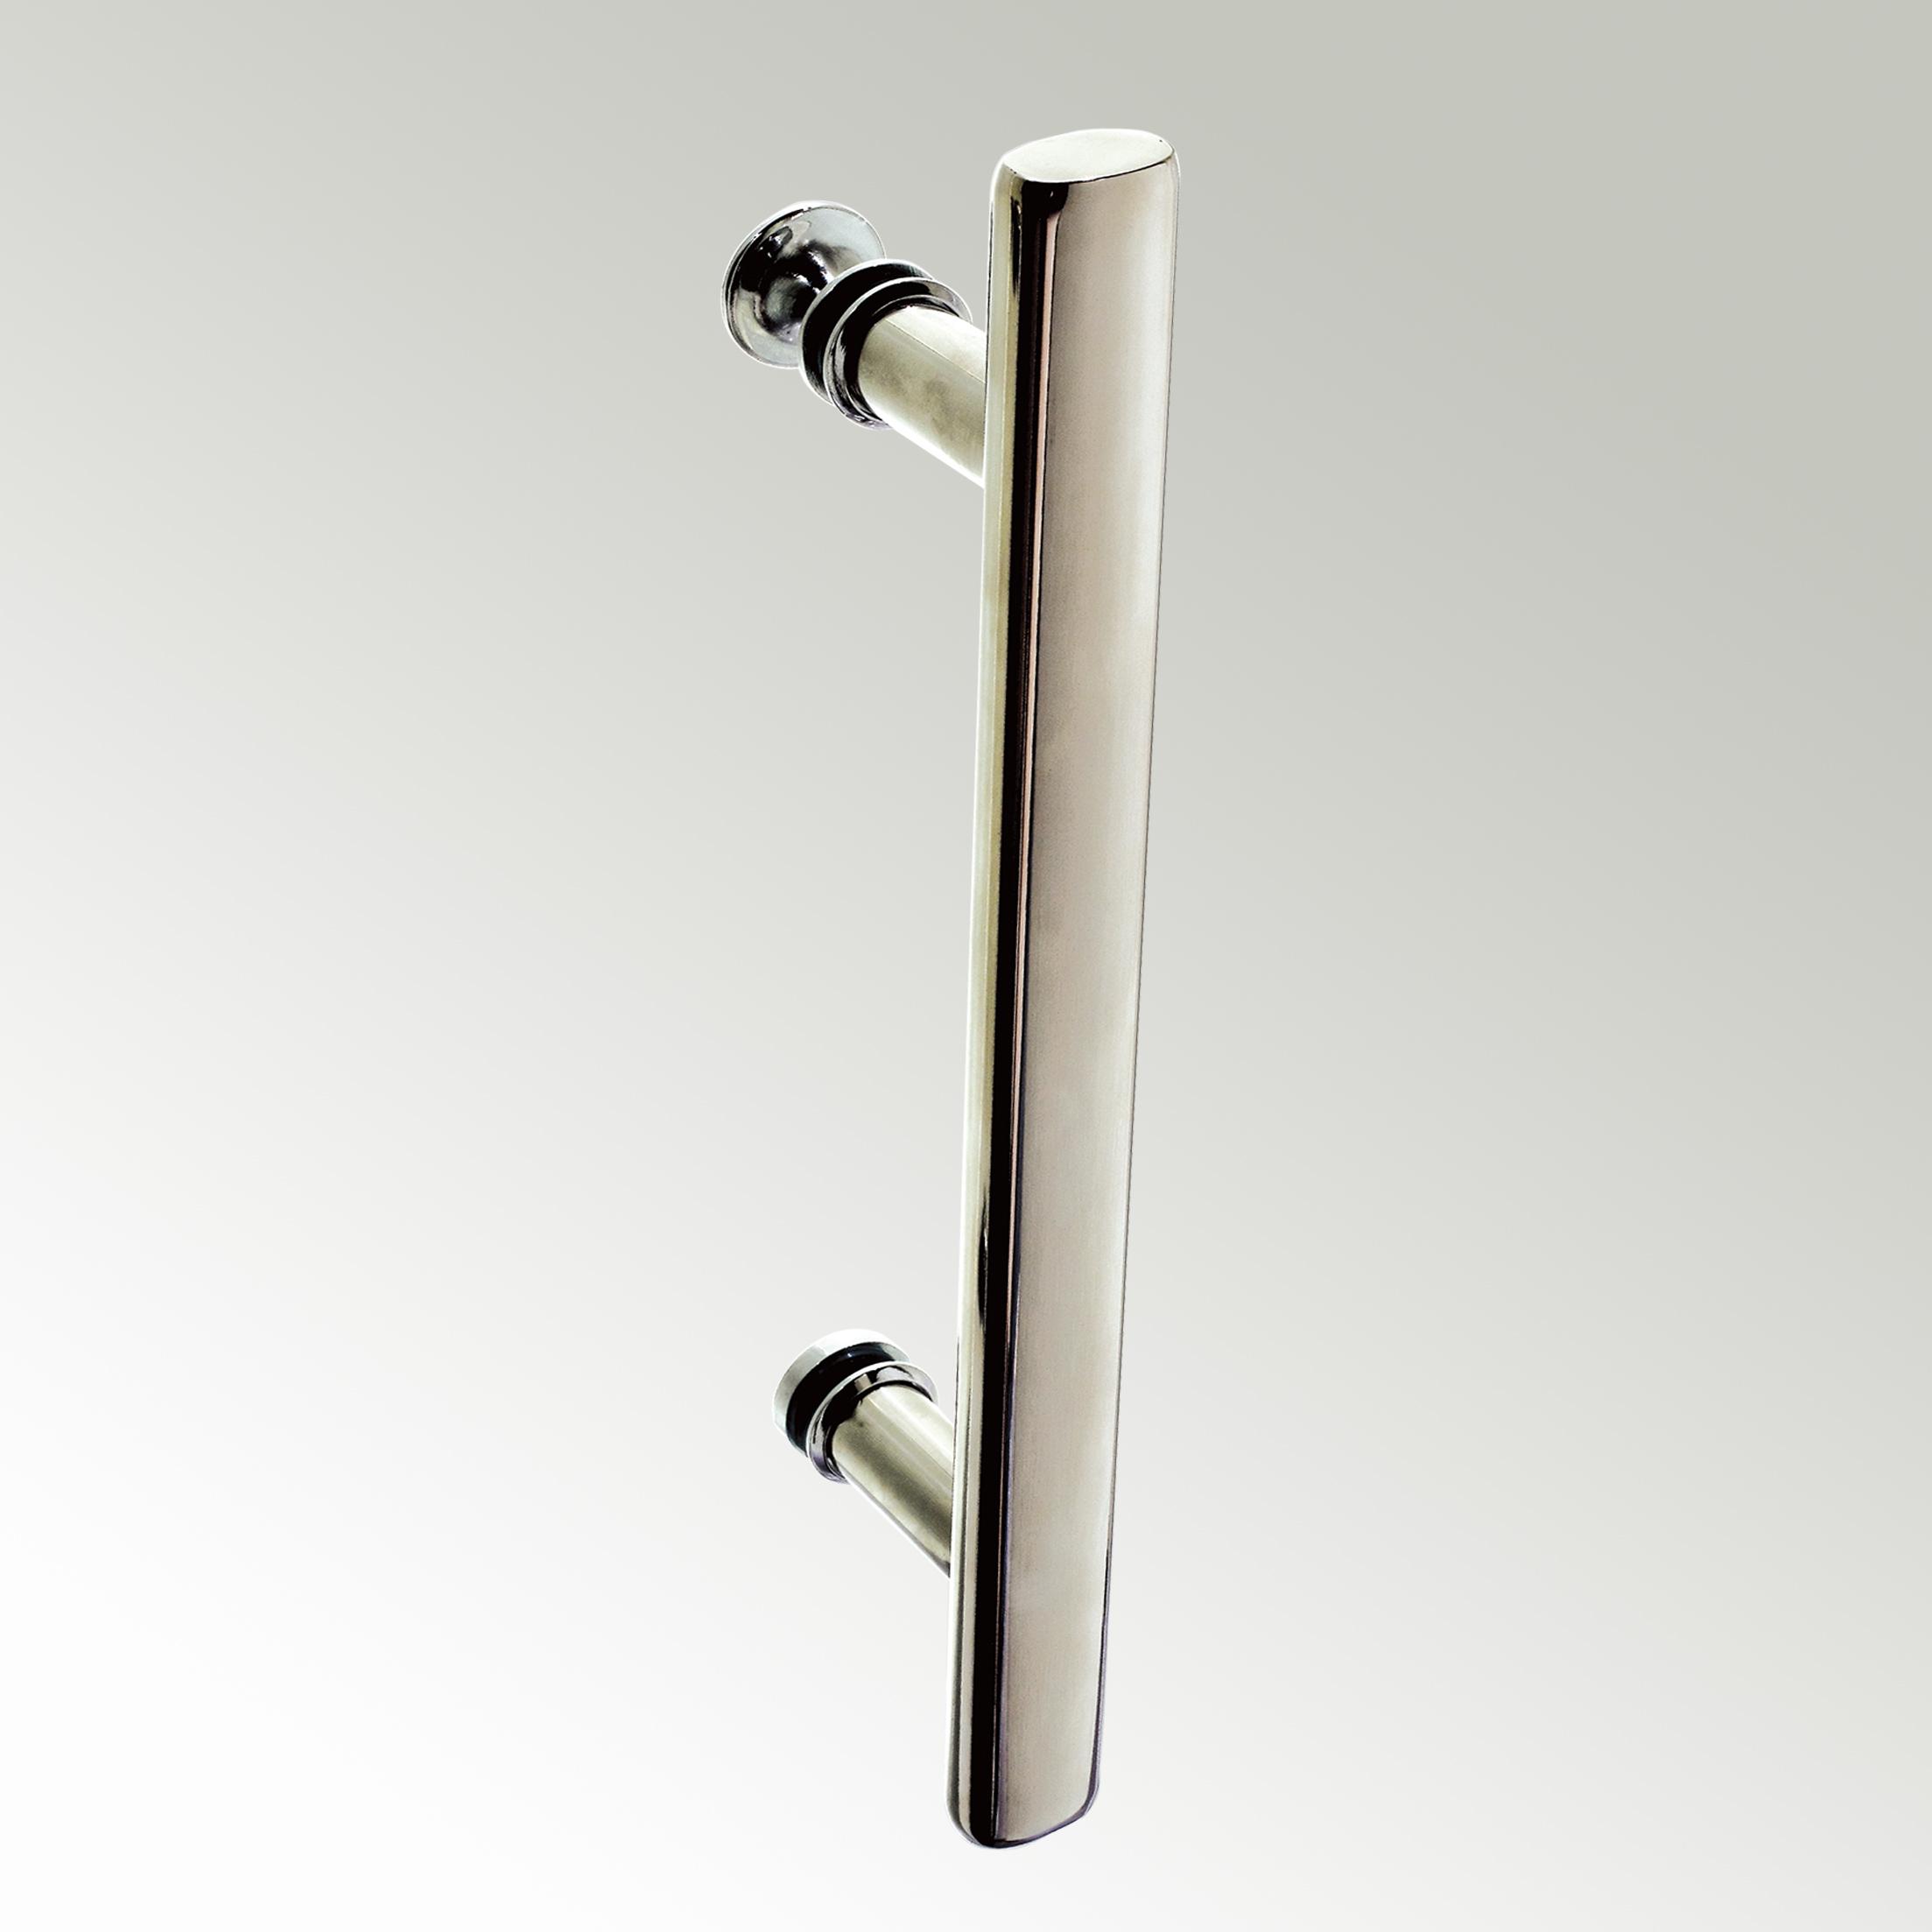 aica pivot hinge shower door enclosure glass screen 700 760 800 900 1000mm